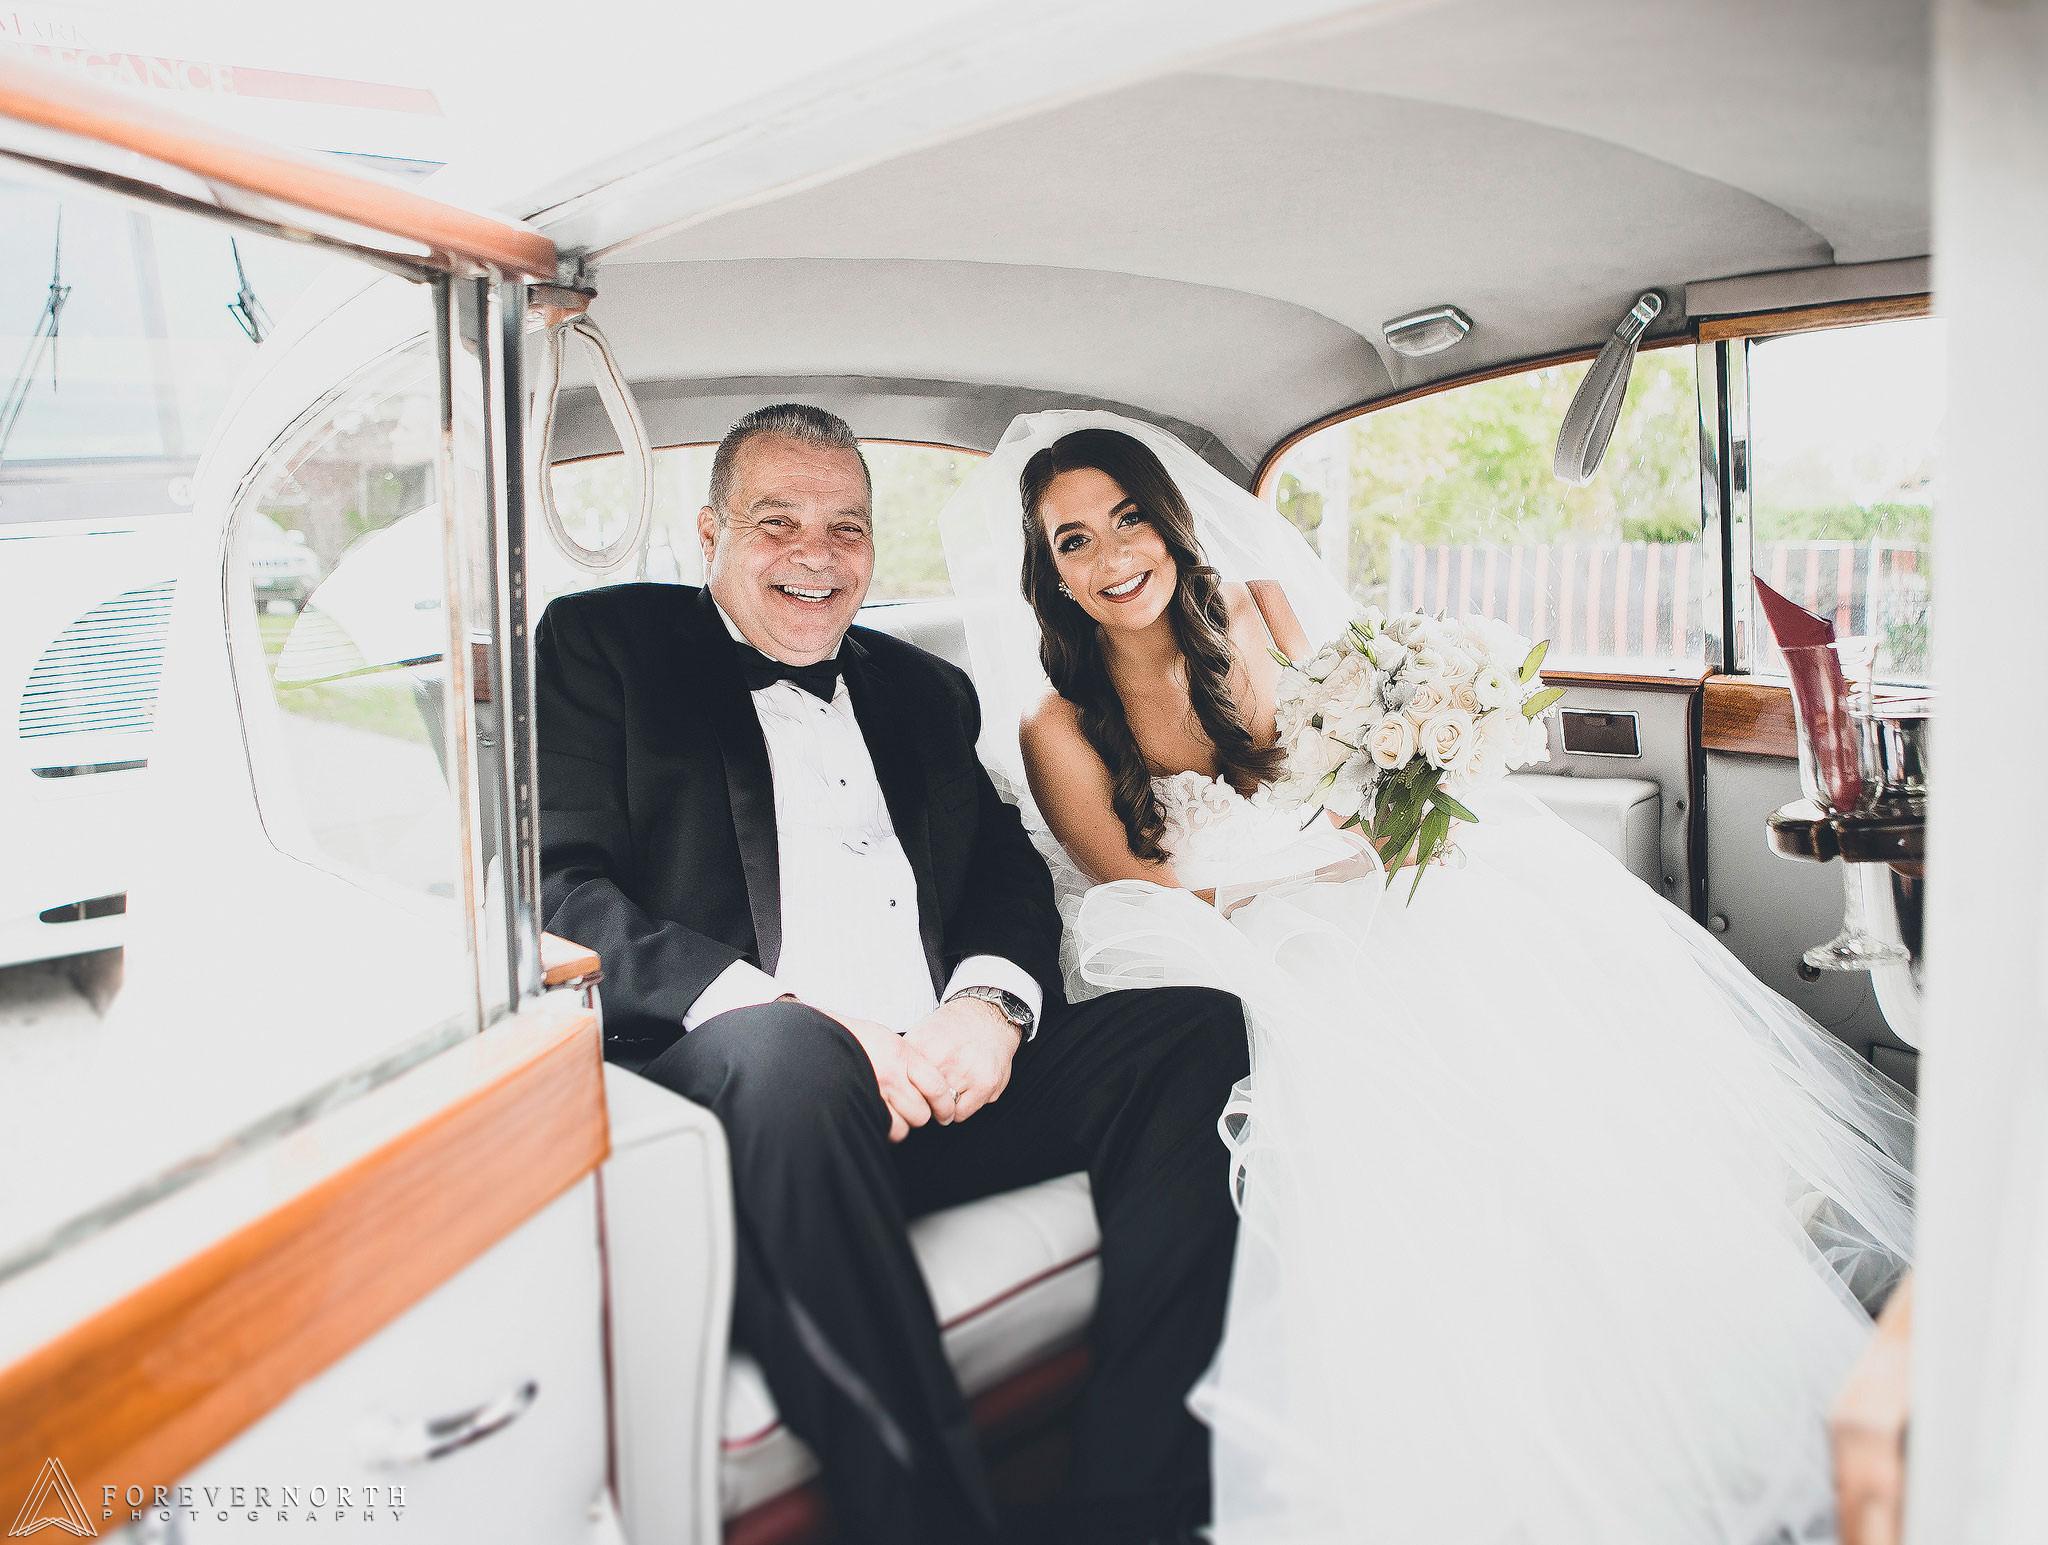 Bergersen-Bethpage-Wedding-Photographer-29.JPG